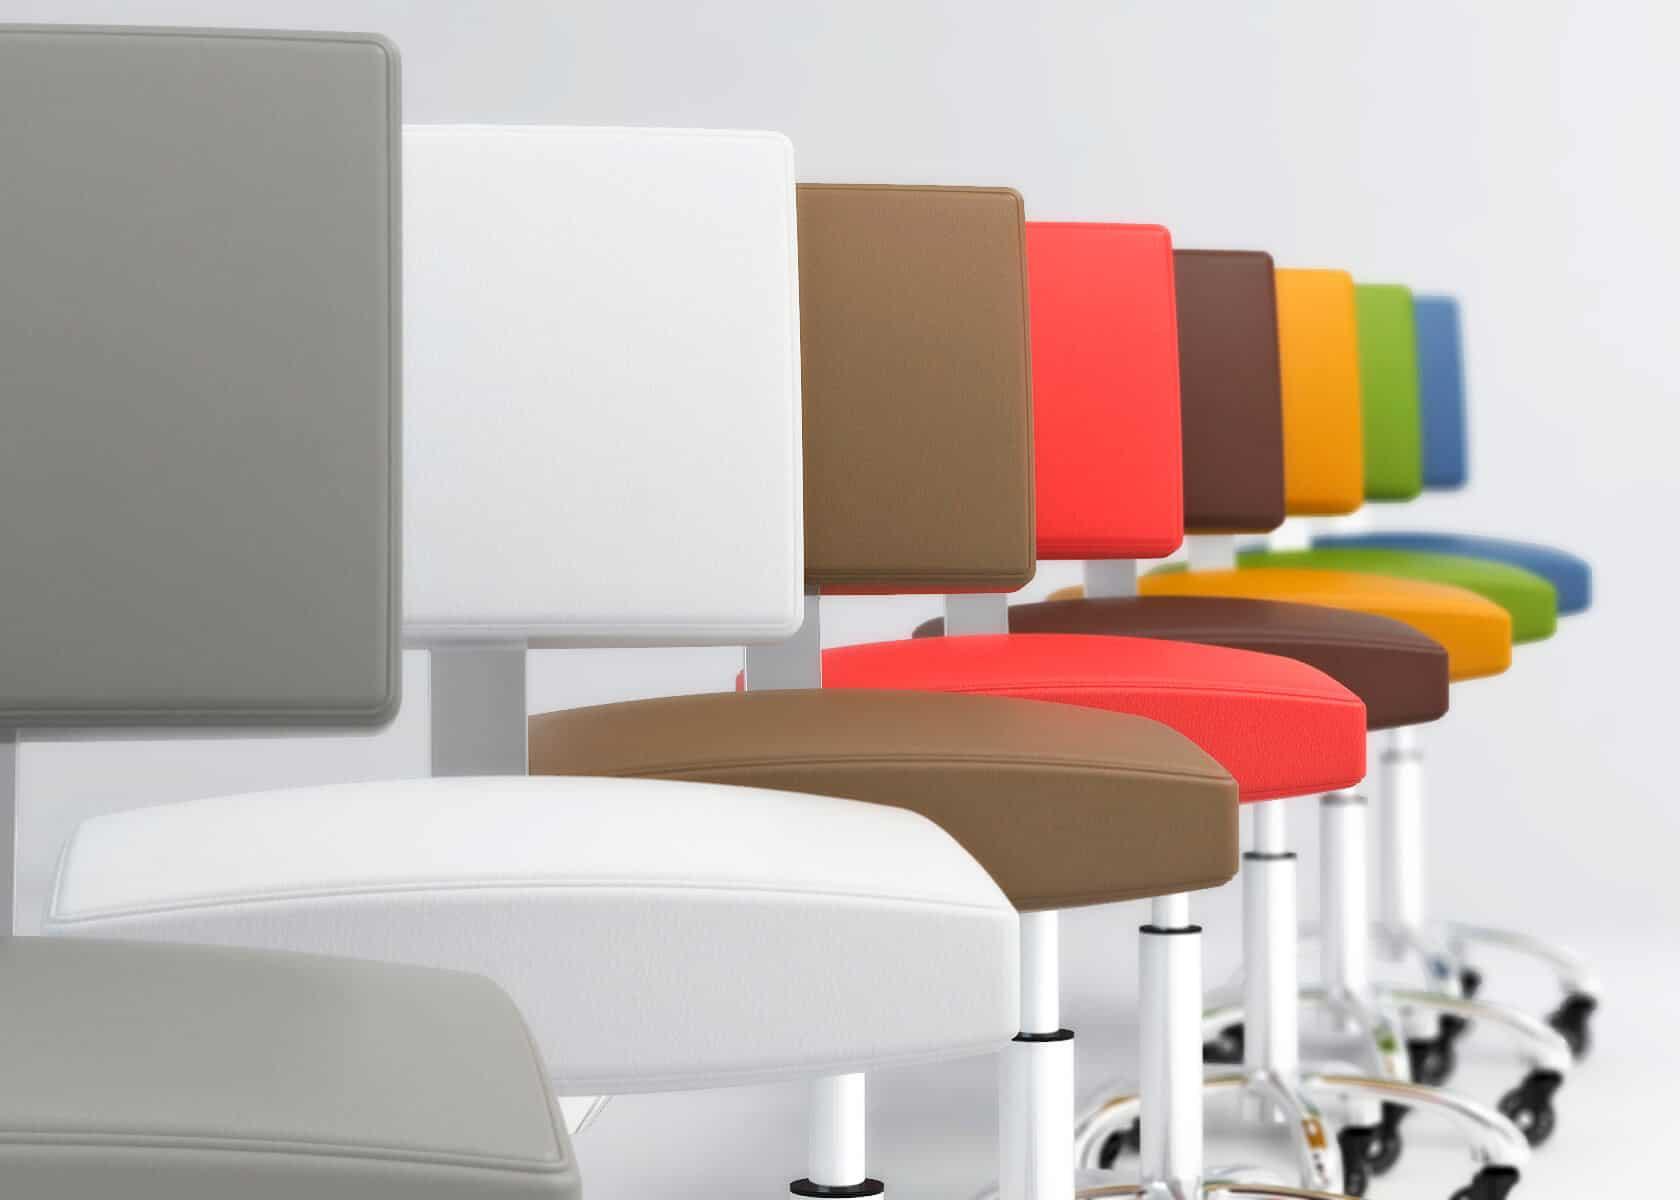 Hair salon and Barber shop furniture distributors